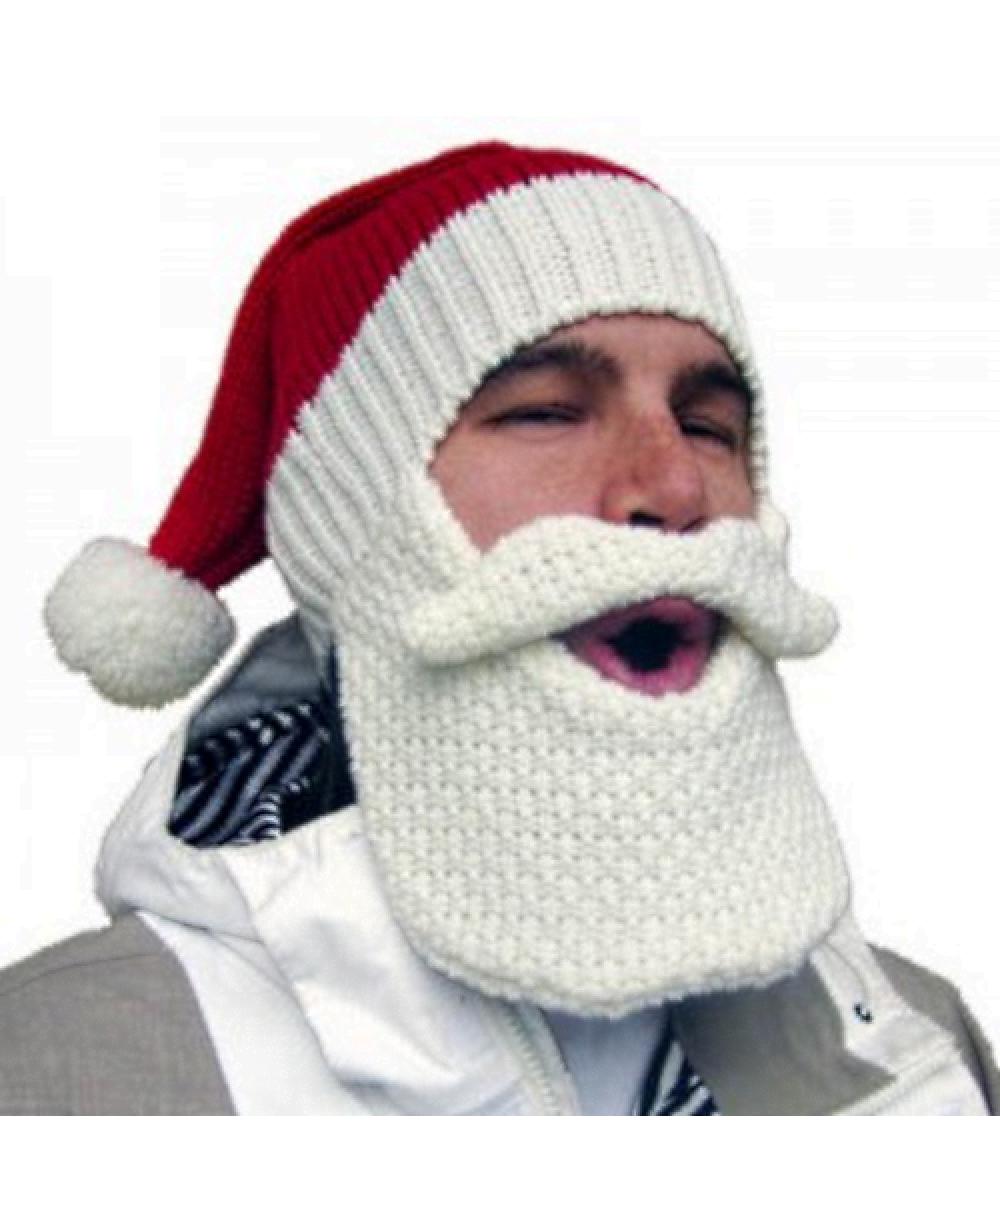 3c3fb90551ecb More Views. Santa Claus Beard Head Knit Hat